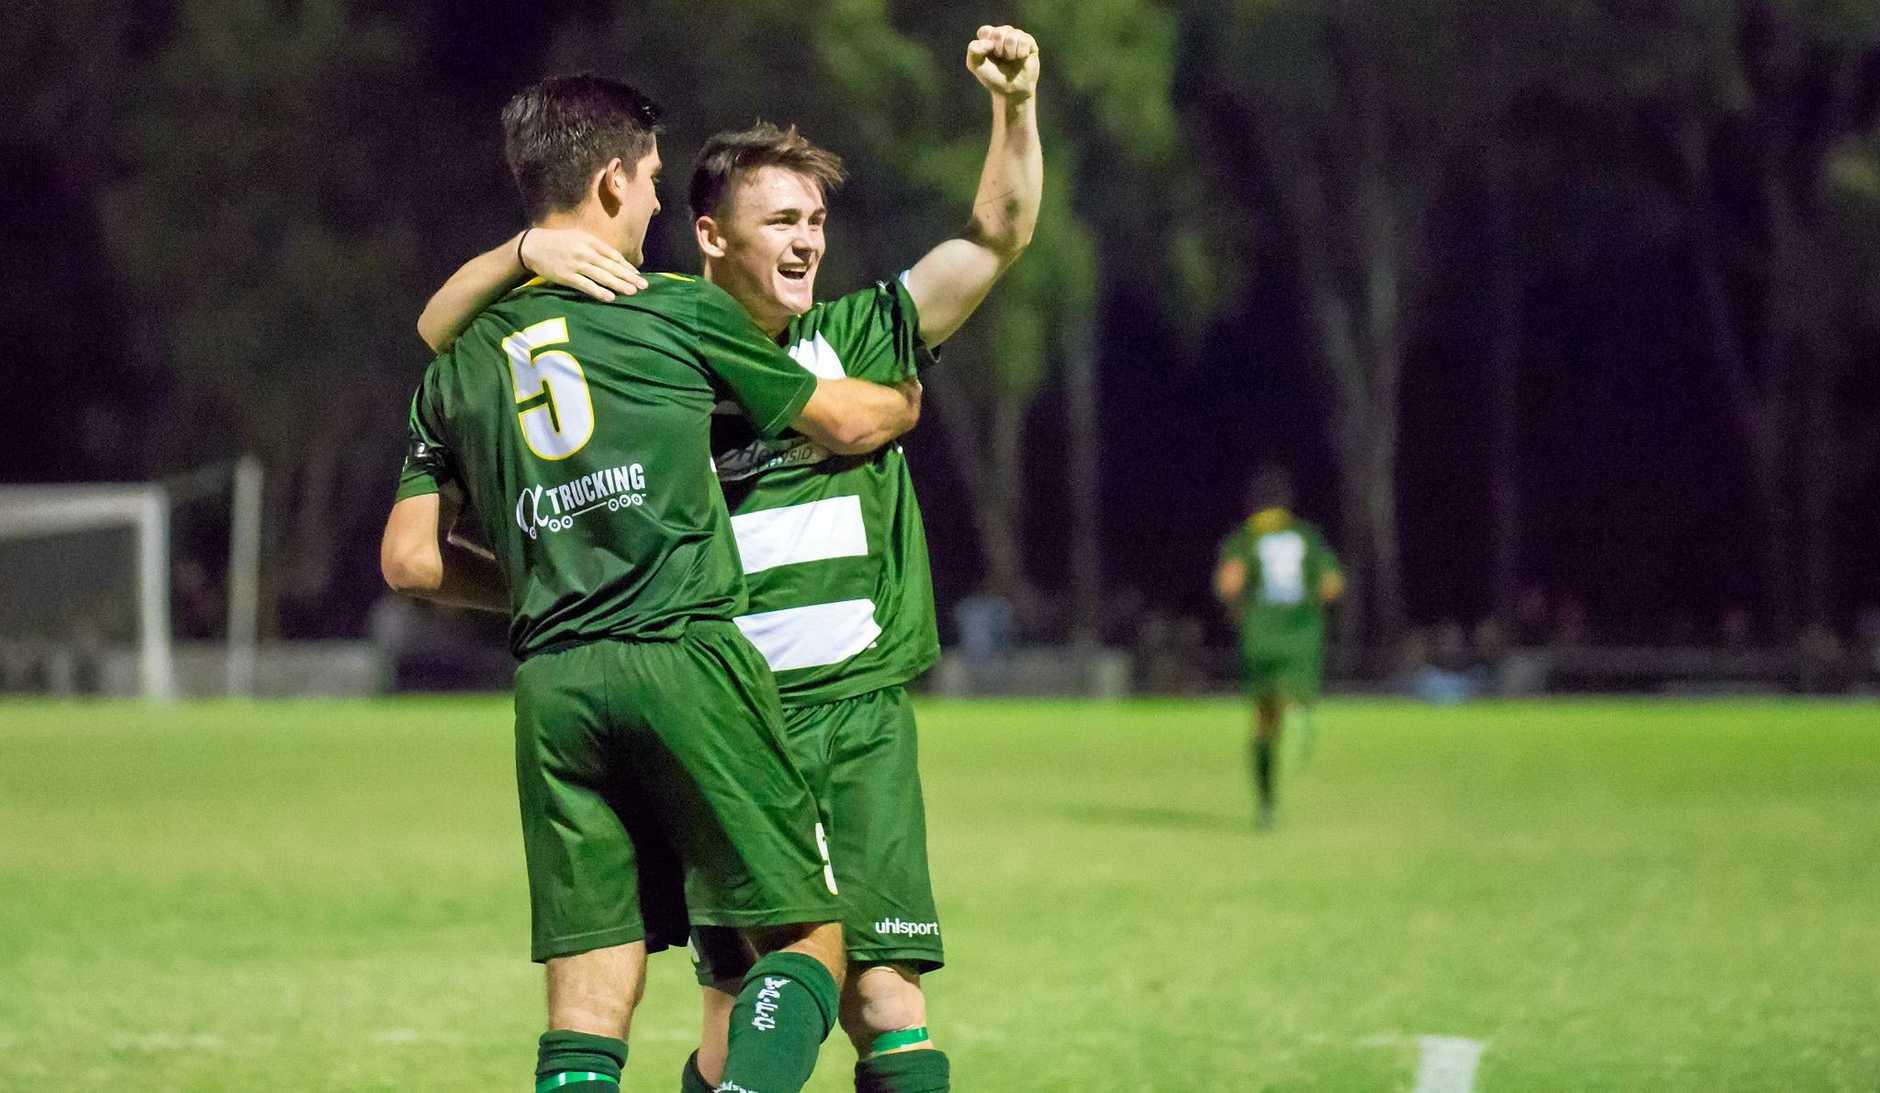 NEW GOALS: Western Pride goal scorers Cam Crestani and Dylan Wenzel-Halls savour their team's grand final victory last season.